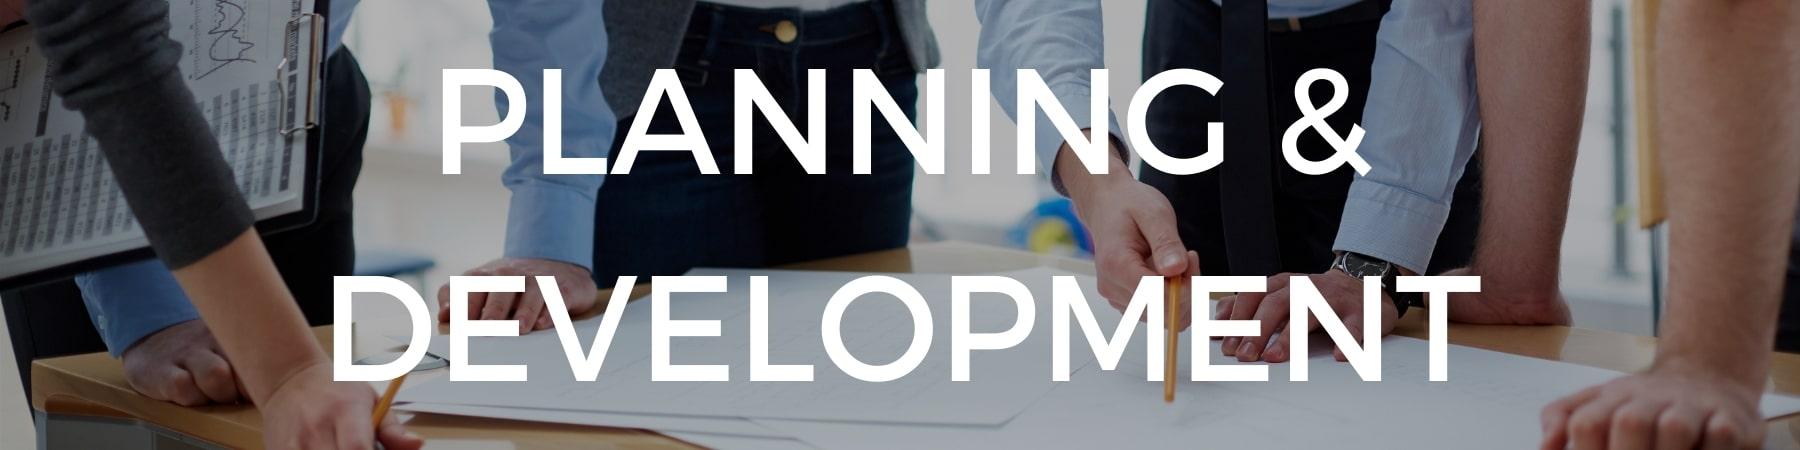 Planning & Development, Resources, Whidbey Island, Oak Harbor, Coupeville, Washington